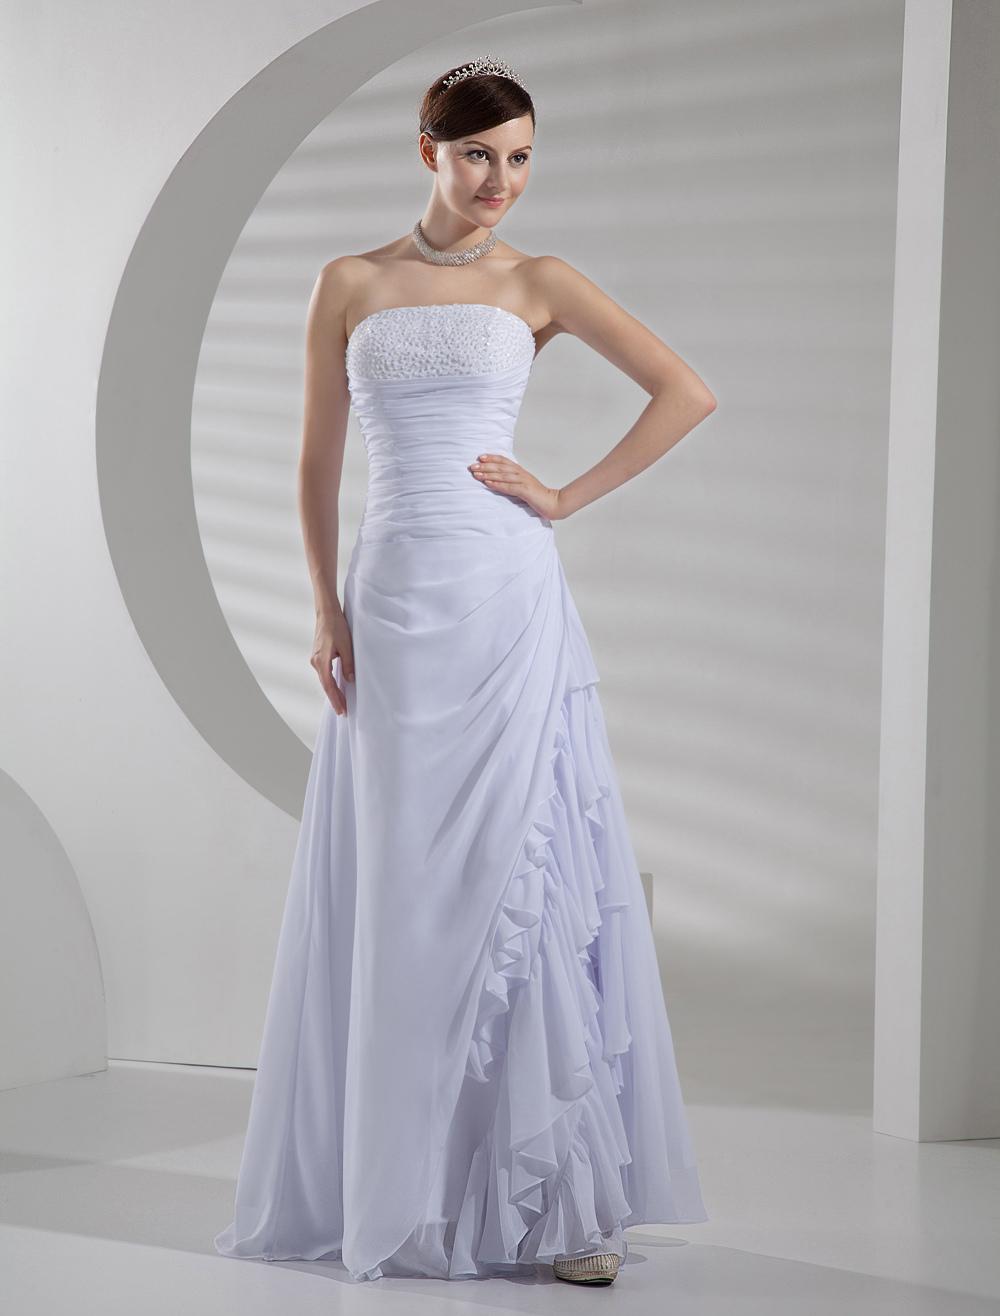 White Chiffon A Line Wedding Dress